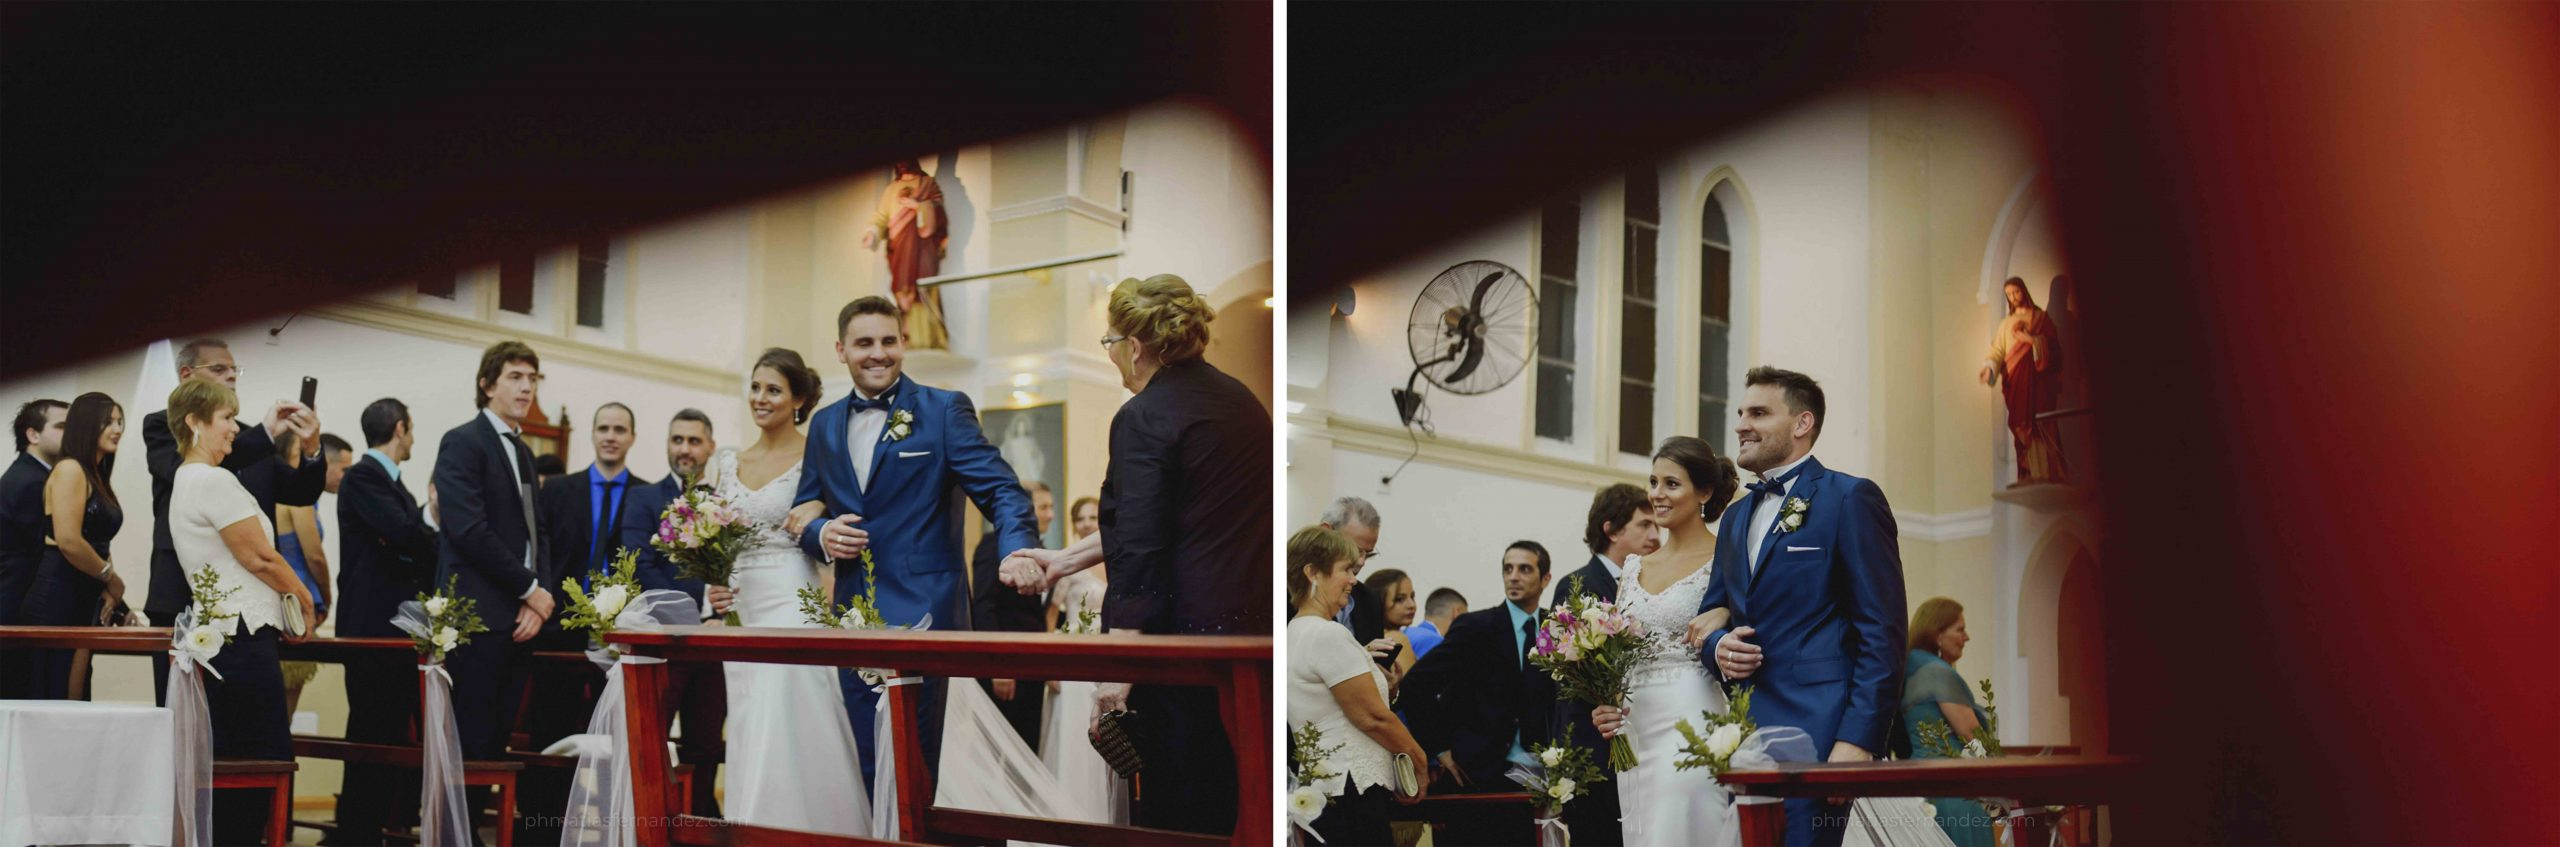 Boda Vicky & Brian - phmatiasfernandez - matias fernandez - matias fernandez fotografo de bodas